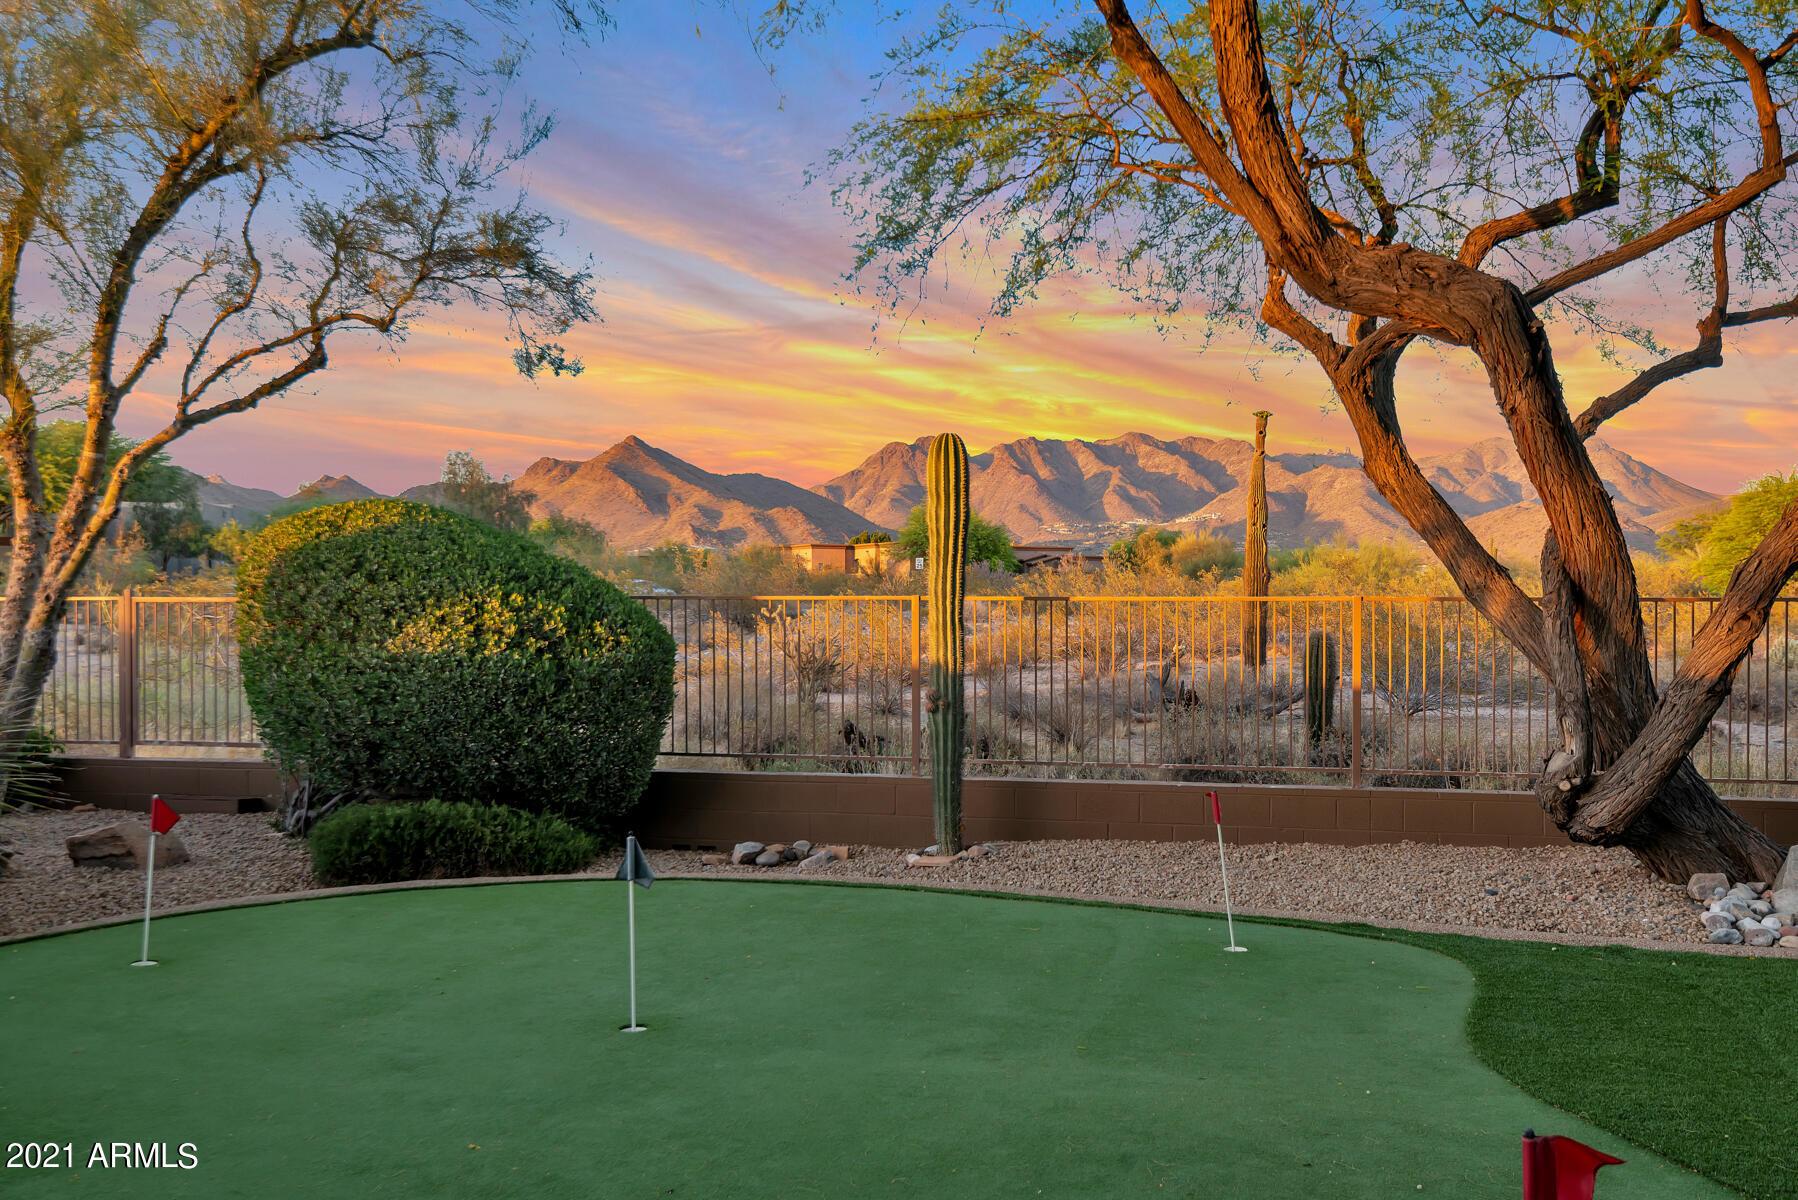 19277 N 91ST Way, Scottsdale, AZ 85255, 3 Bedrooms Bedrooms, ,Residential Lease,For Rent,19277 N 91ST Way,6267588